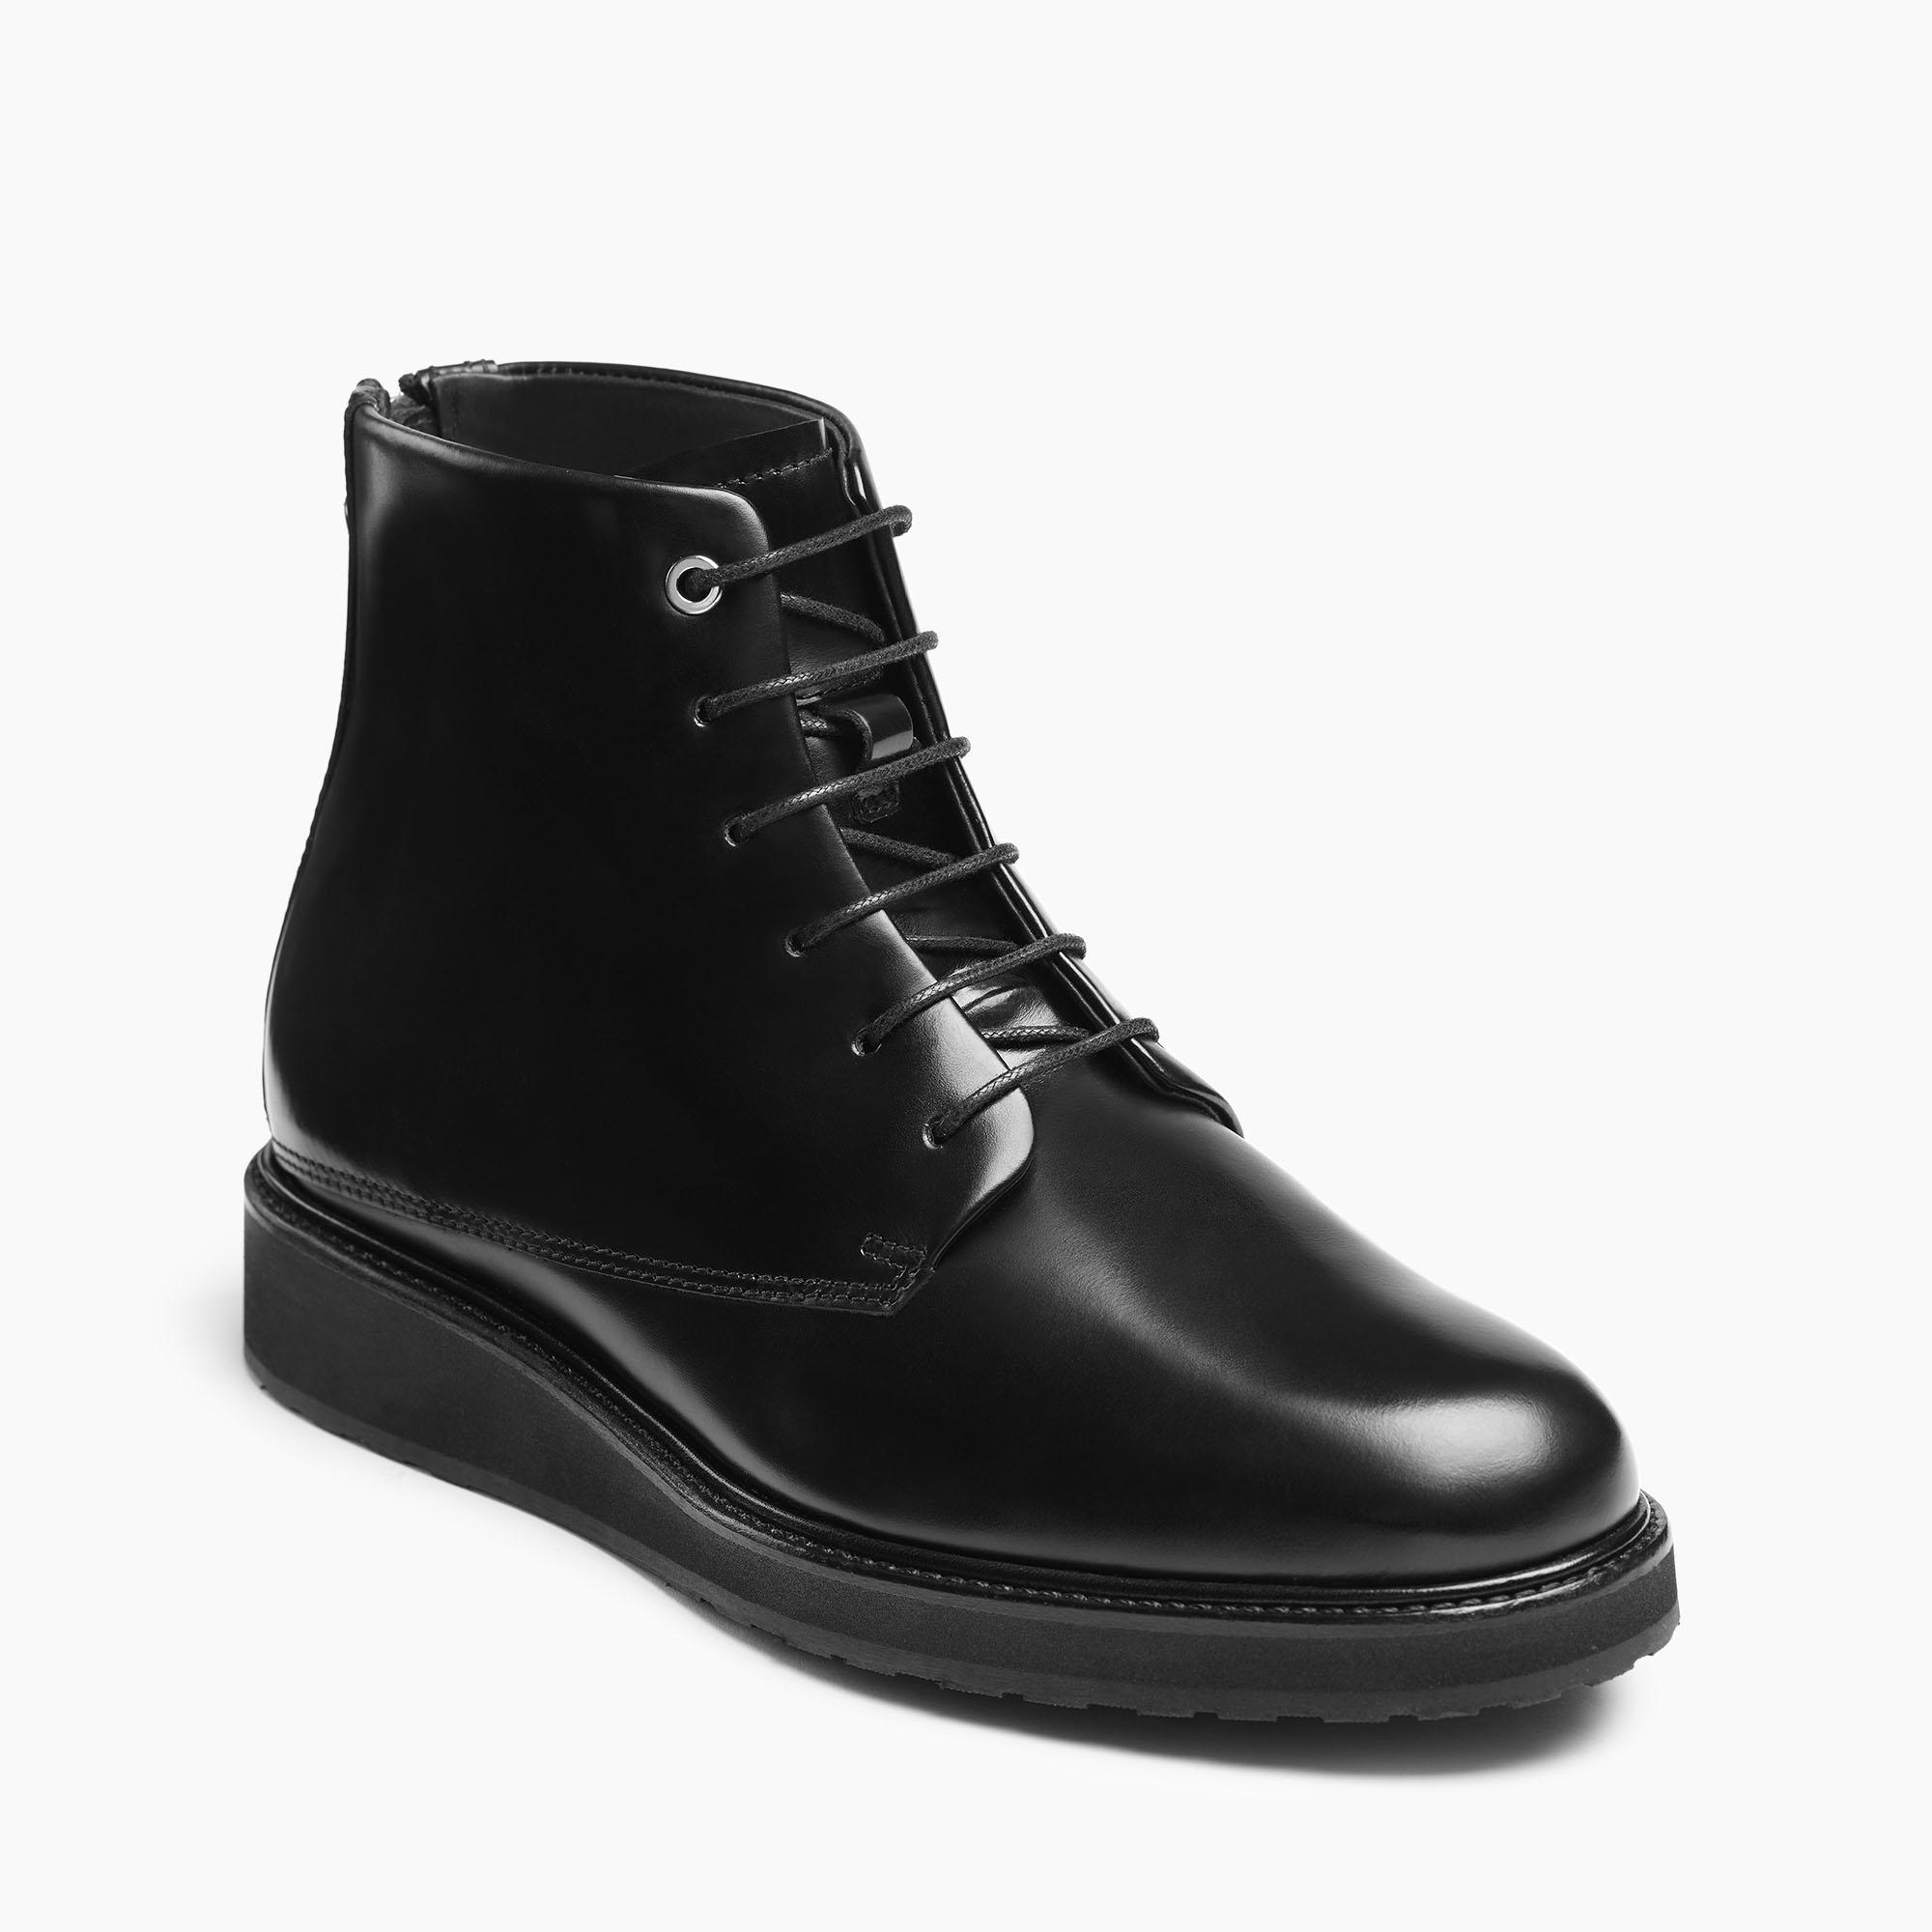 want-les-esseentiels-womens-footwear-collection-4